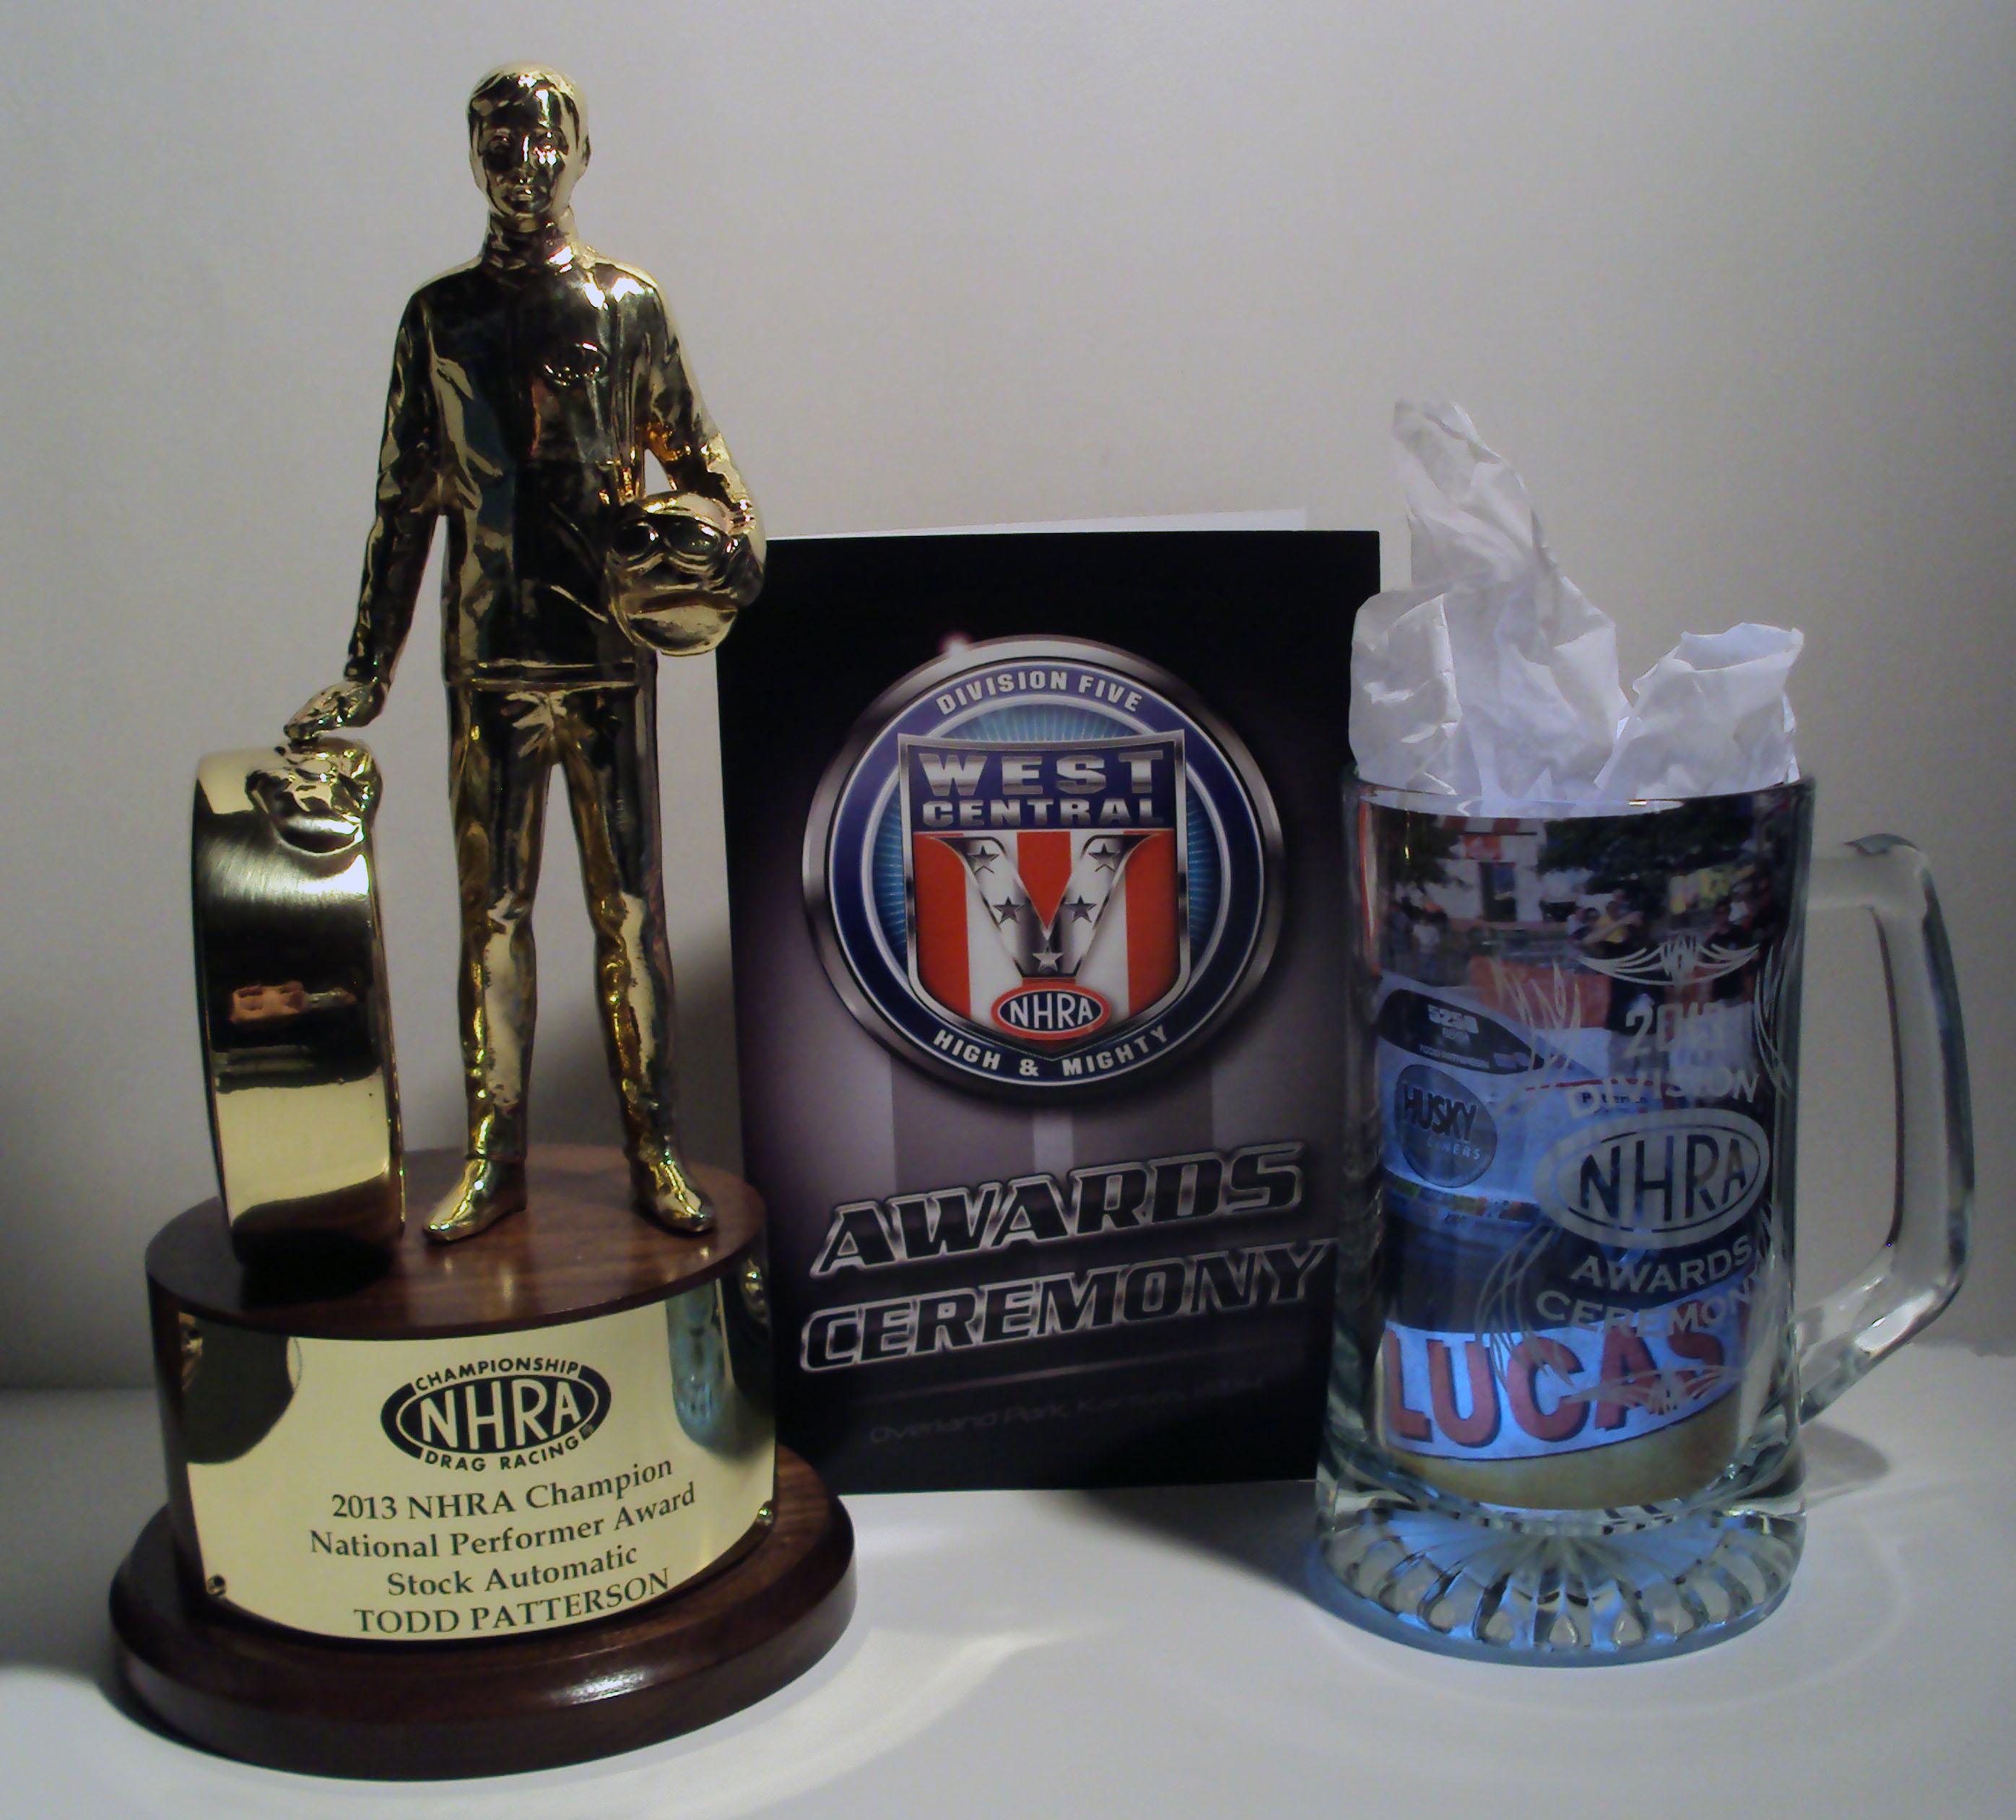 todd-patterson-2013-national-performer-award-copo-camaro